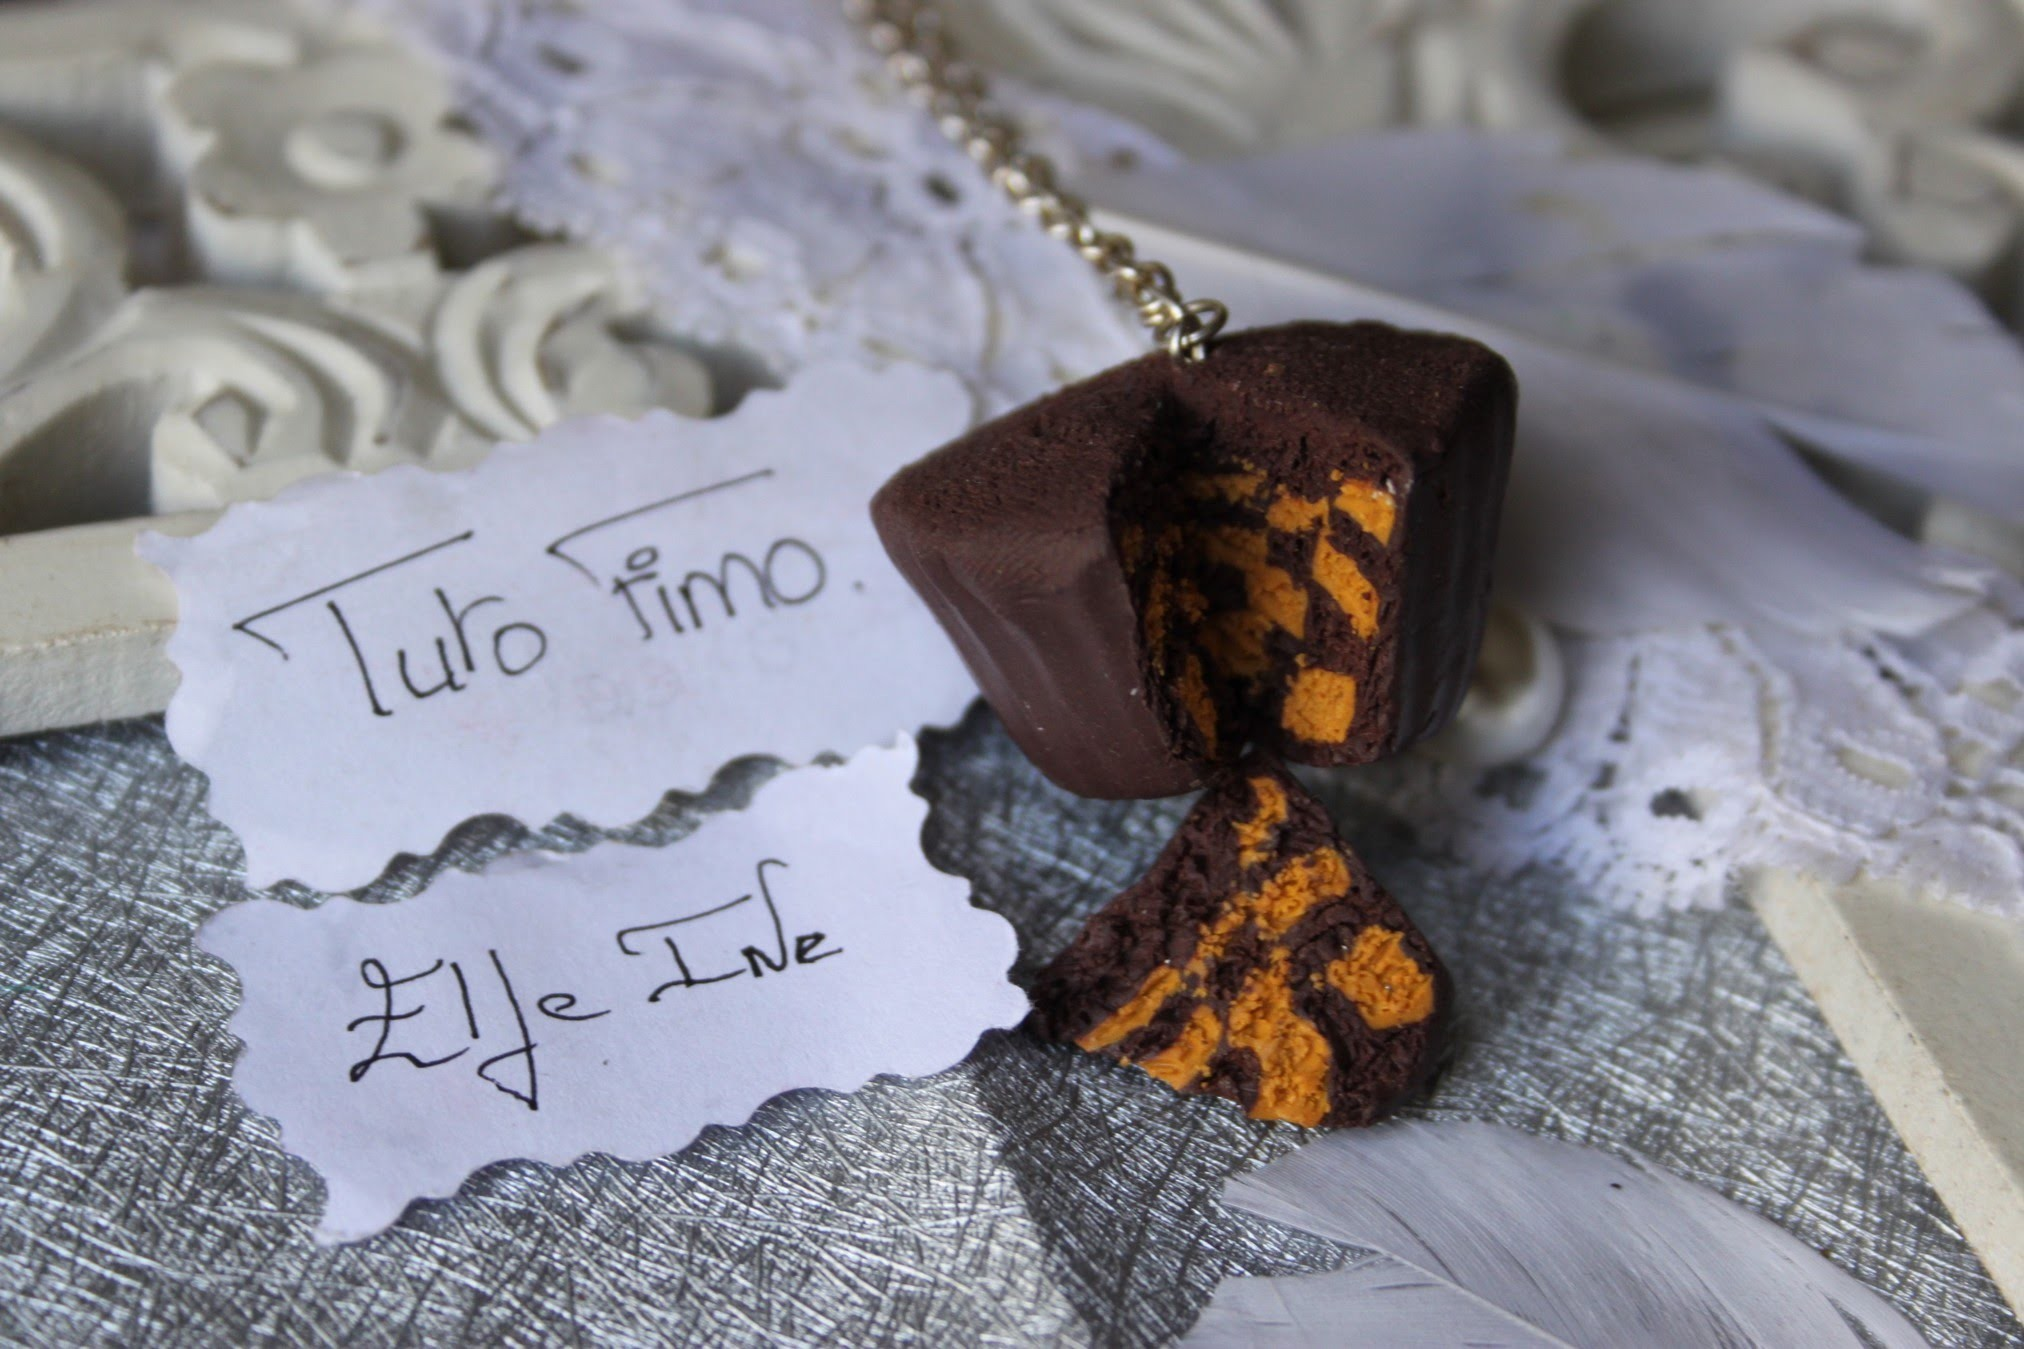 [♥✿ Tuto Fimo : cupcake damier ✿♥] ~ [♥✿ Polymer Clay Tutorial : cupcake checkerboard✿♥]